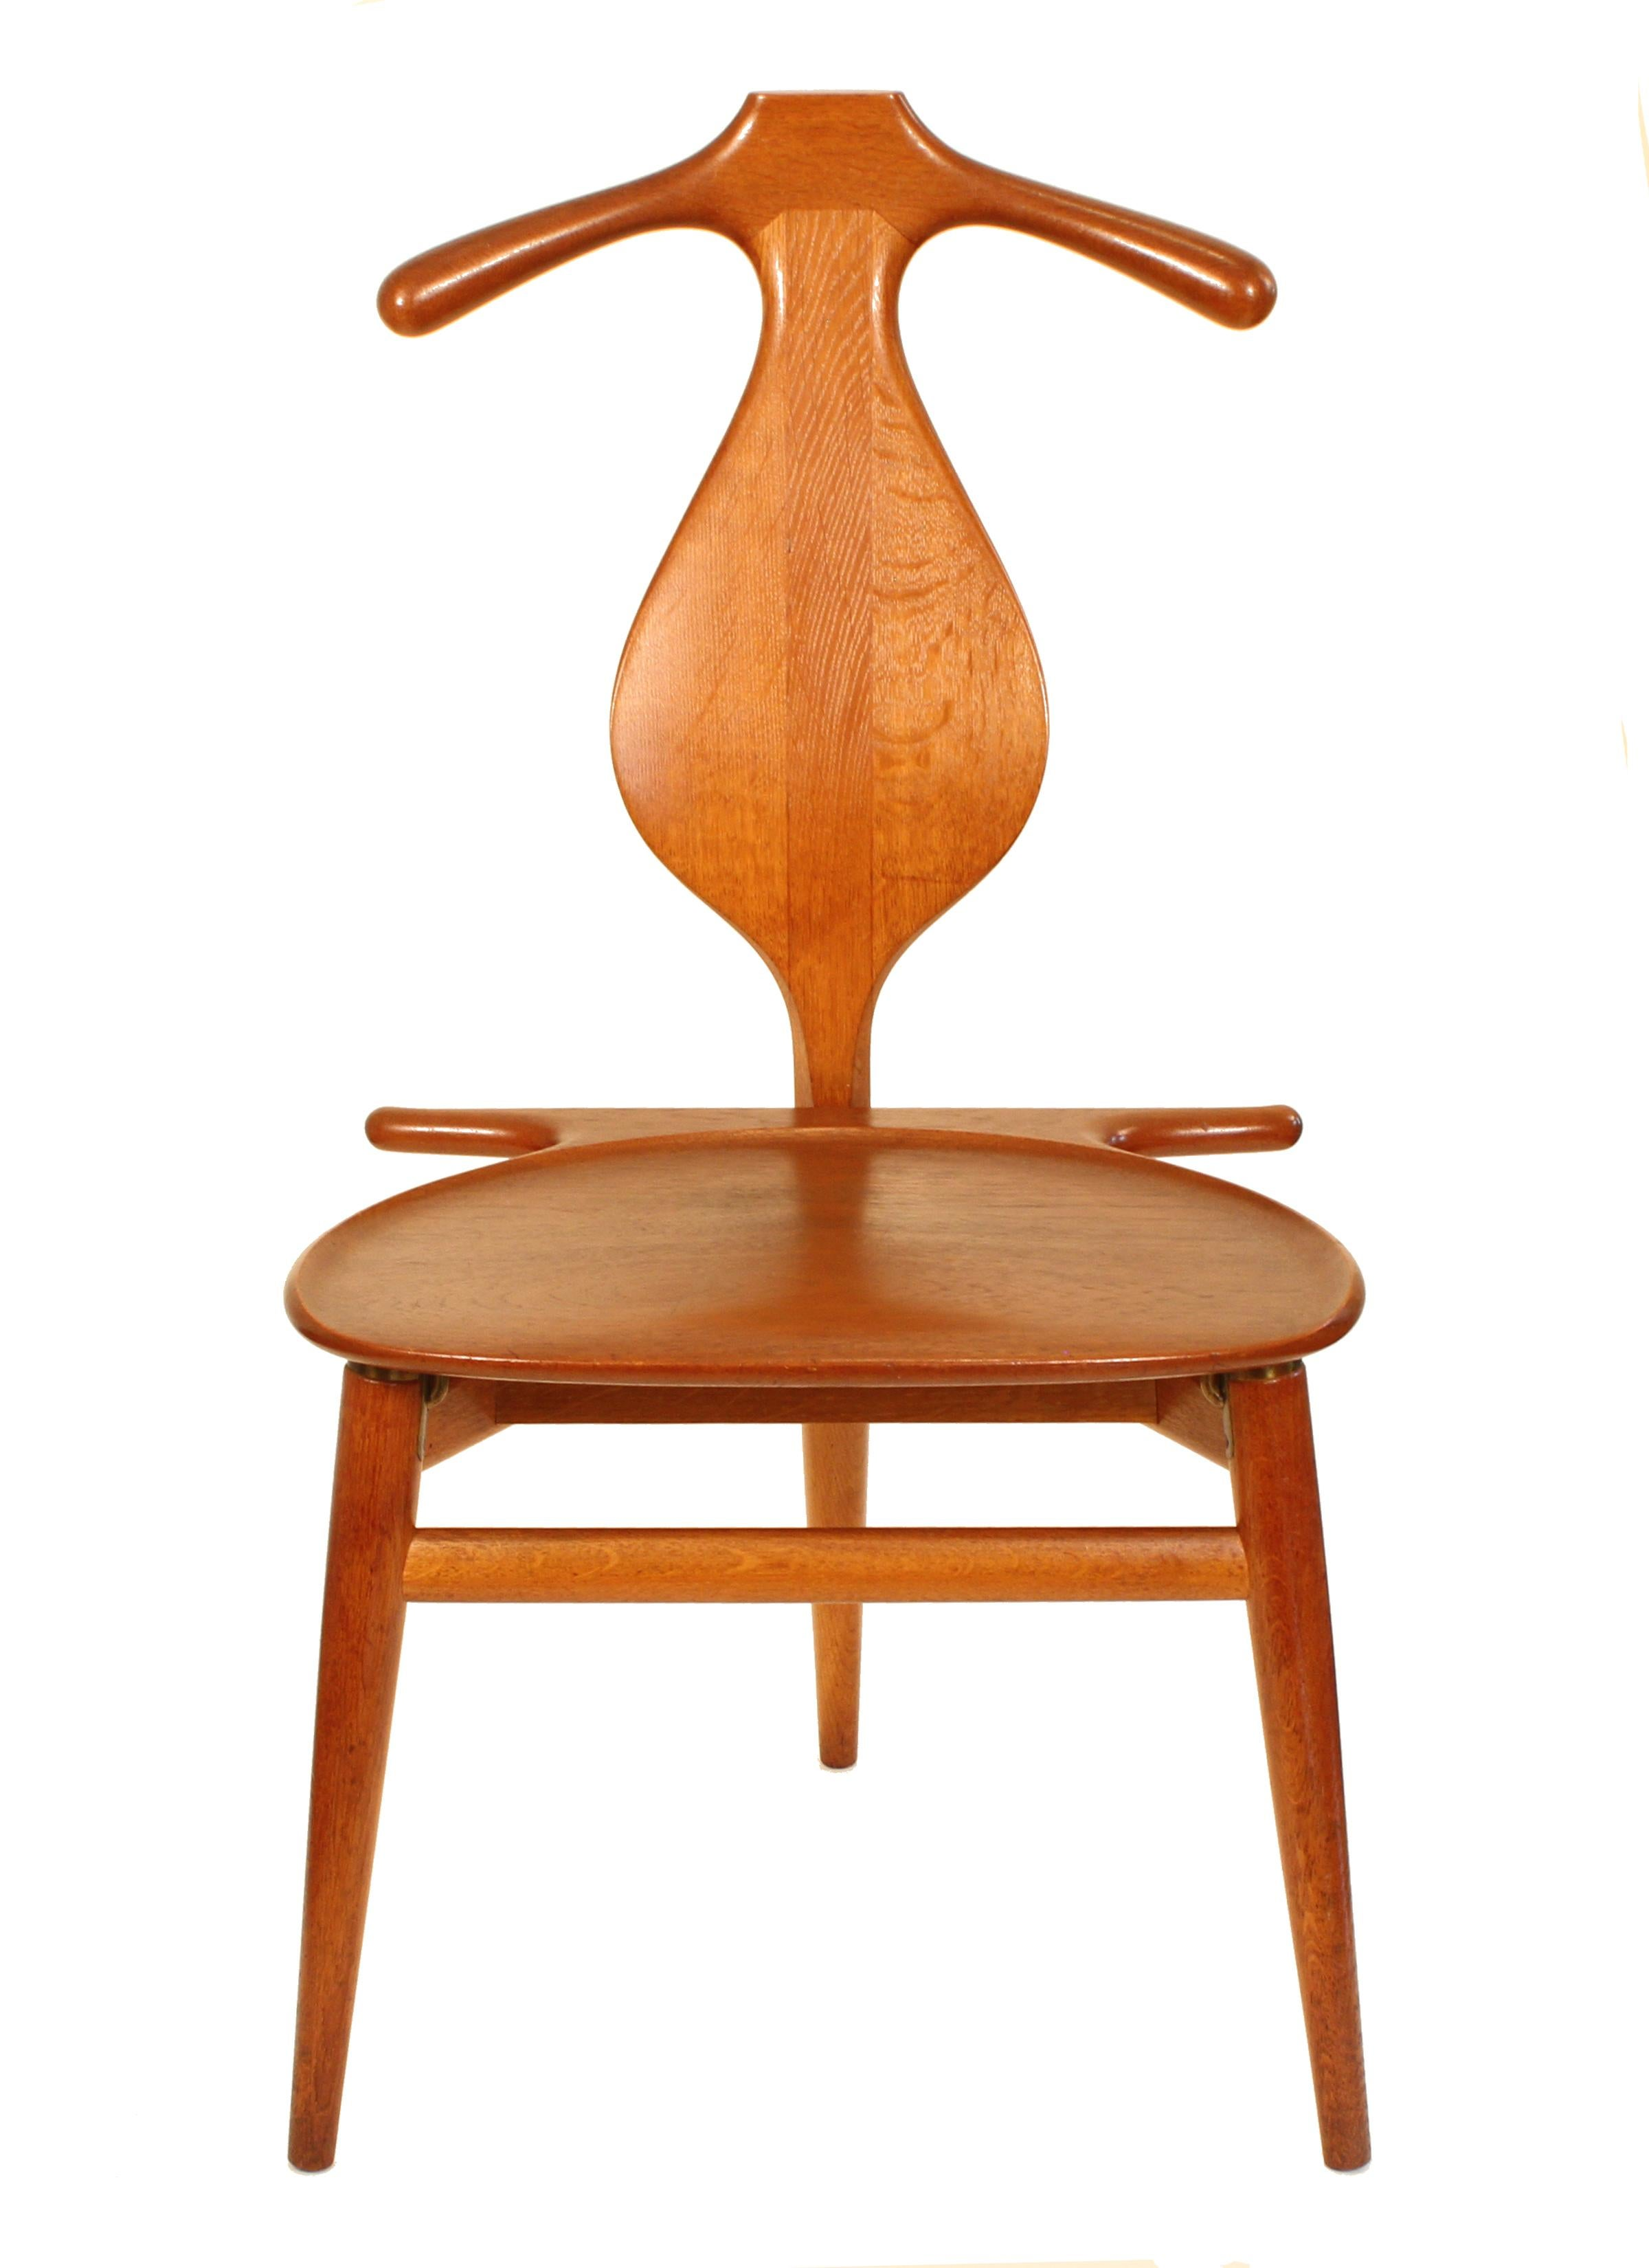 hans wegner chairs design within reach ikea kneeling chair quotvalet quot chairish